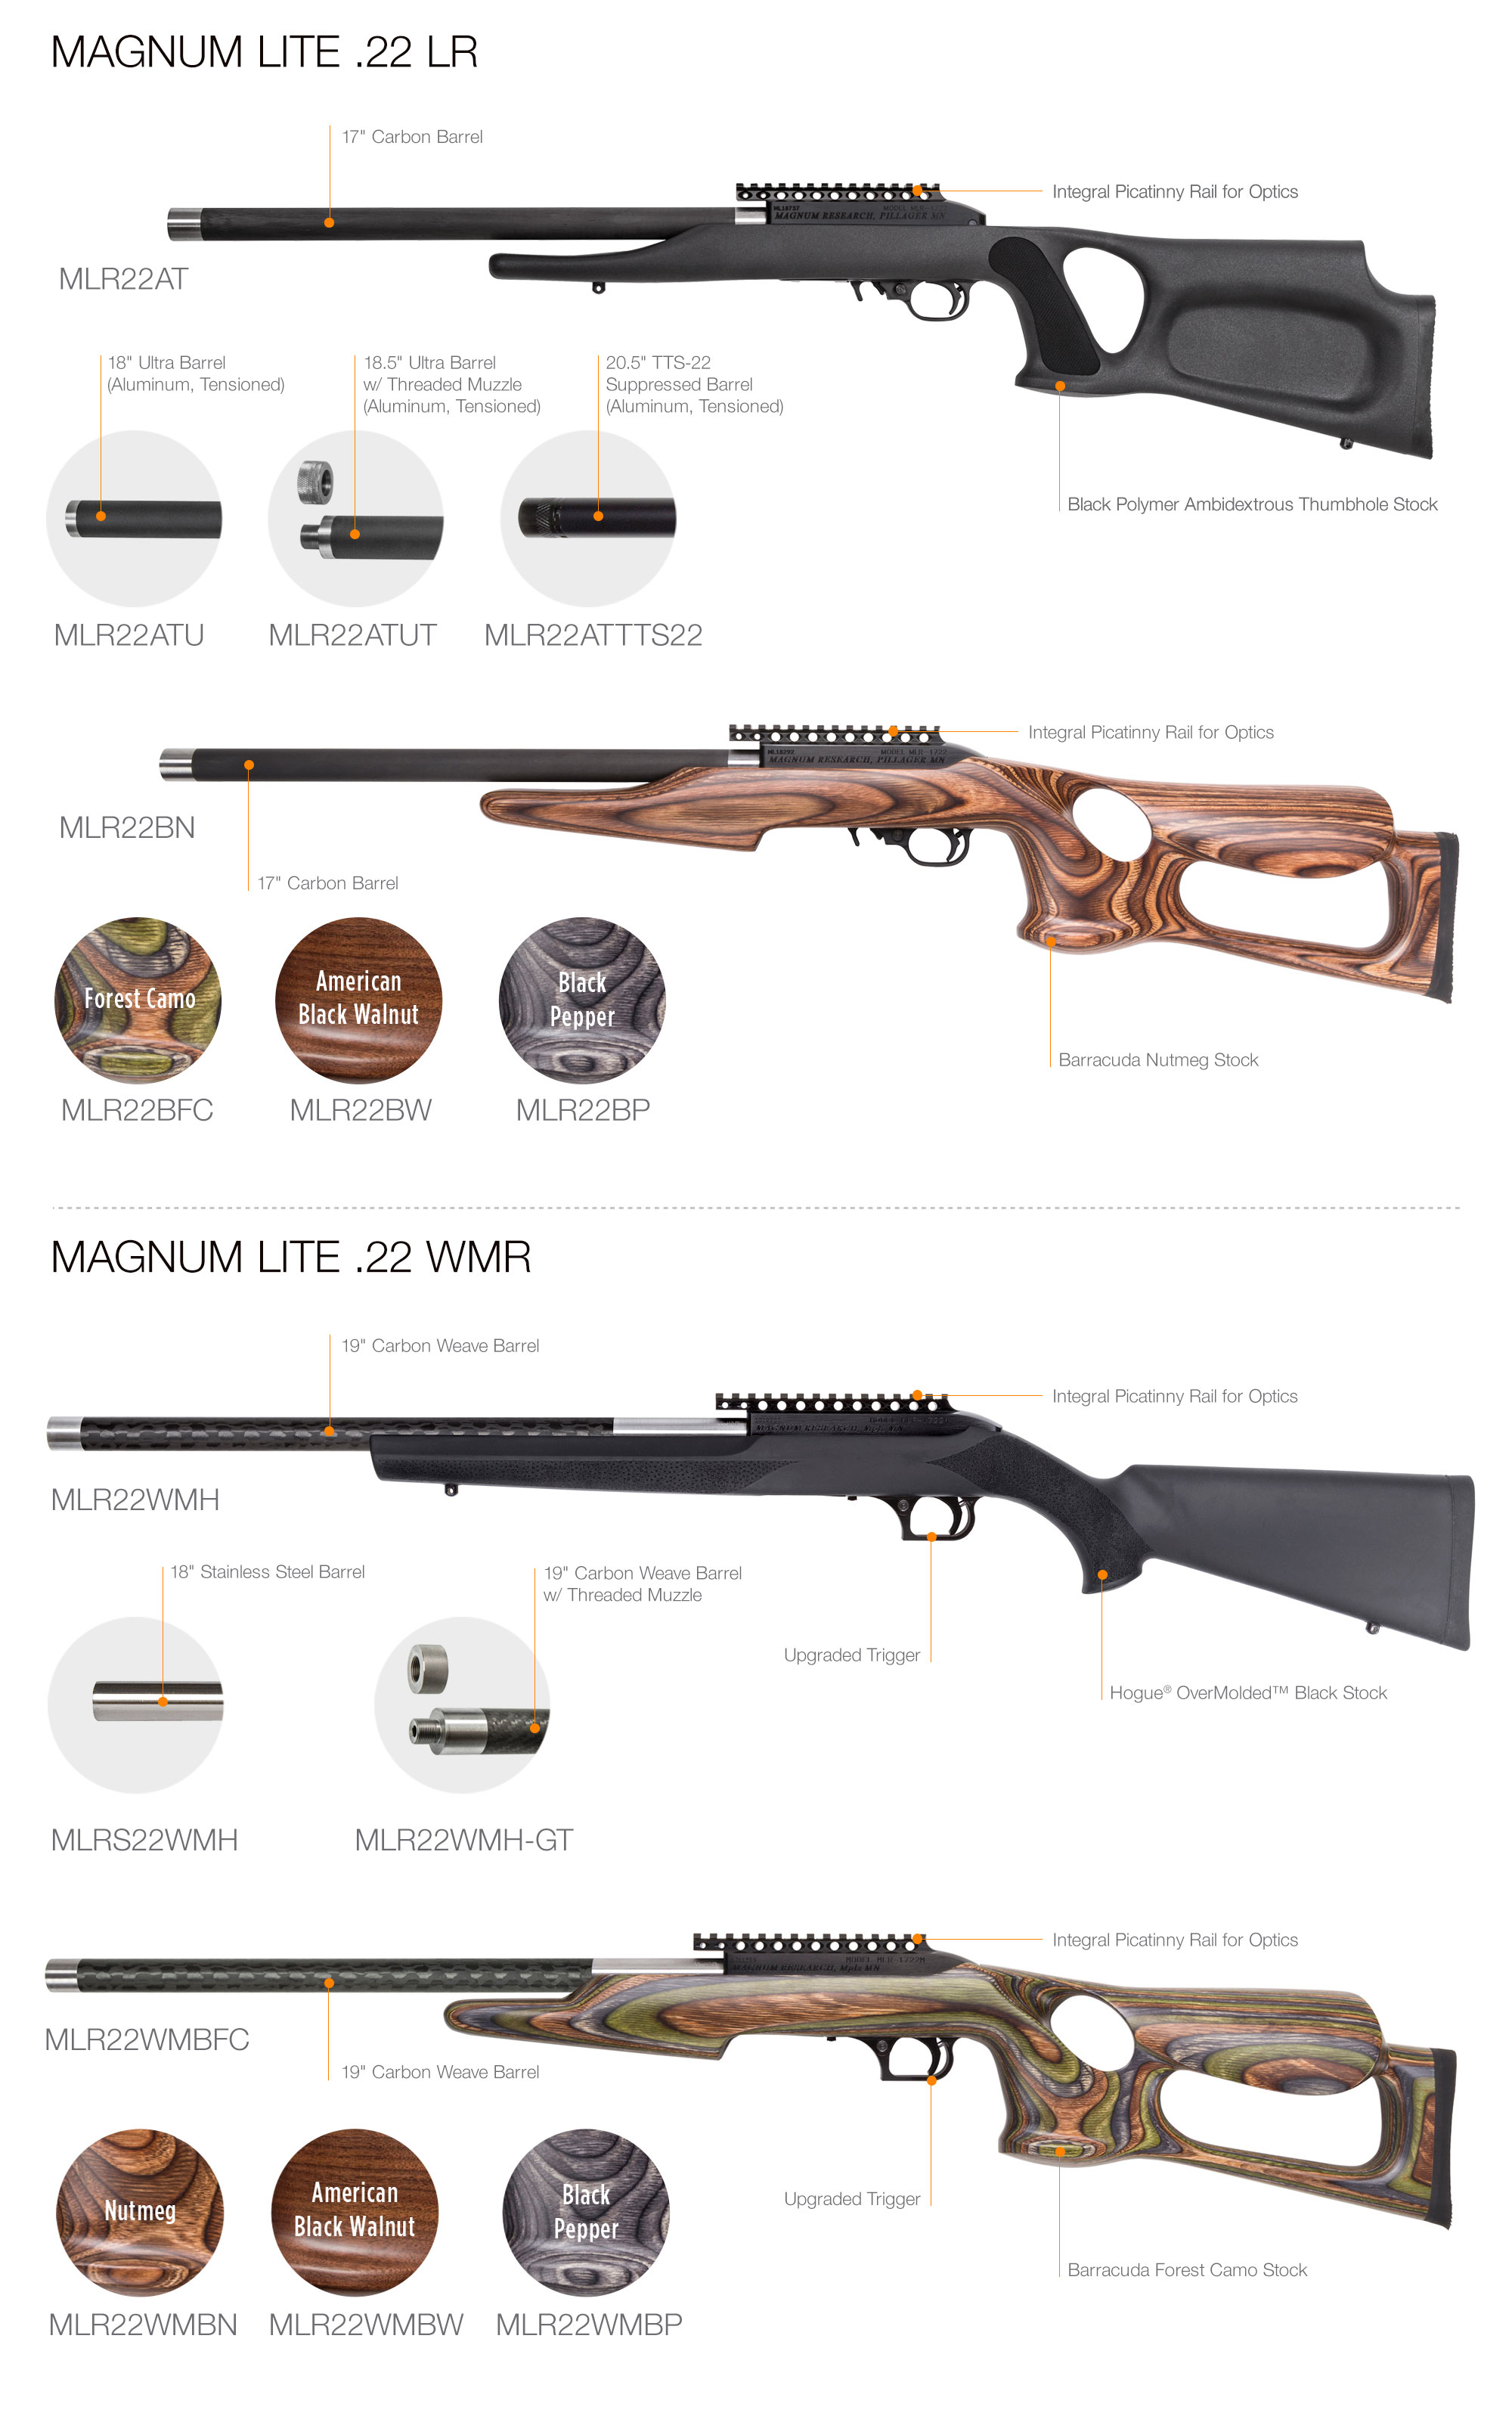 Magnum Lite  22 LR /  22 WMR - Magnum Research, Inc